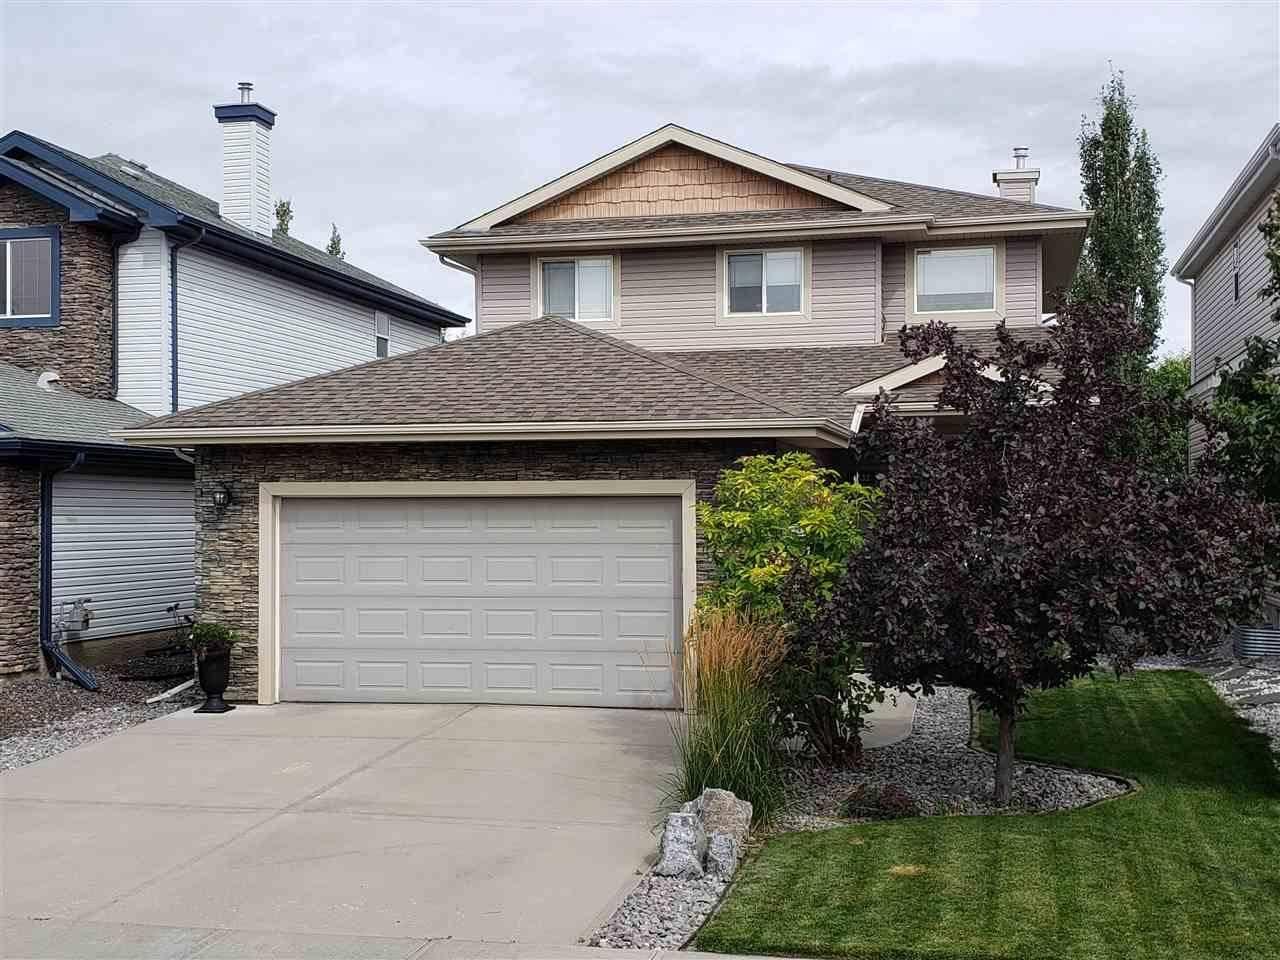 House for sale at 6332 Sandin Wy Nw Edmonton Alberta - MLS: E4171739